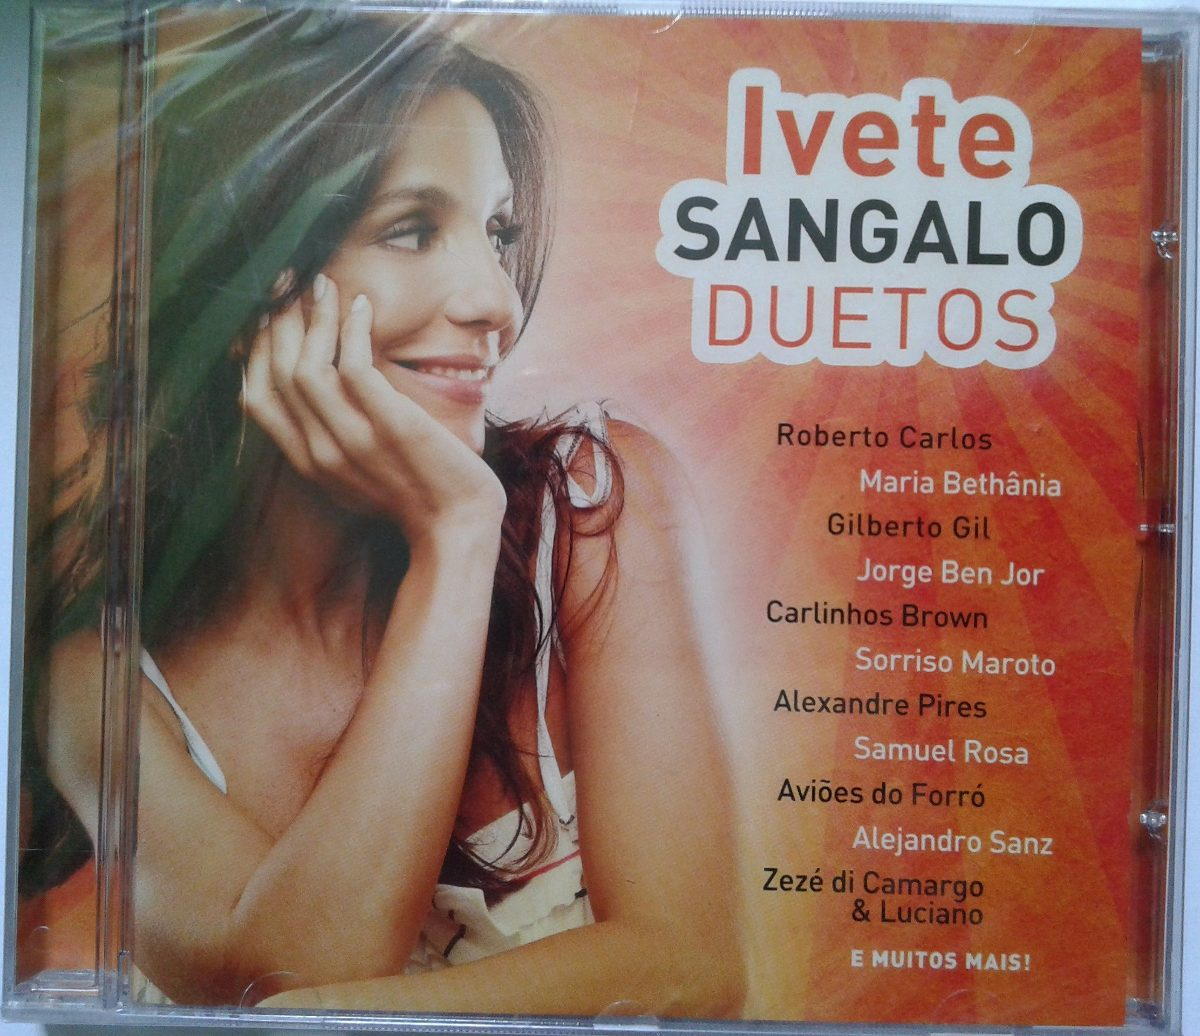 gratis cd de ivete sangalo duetos